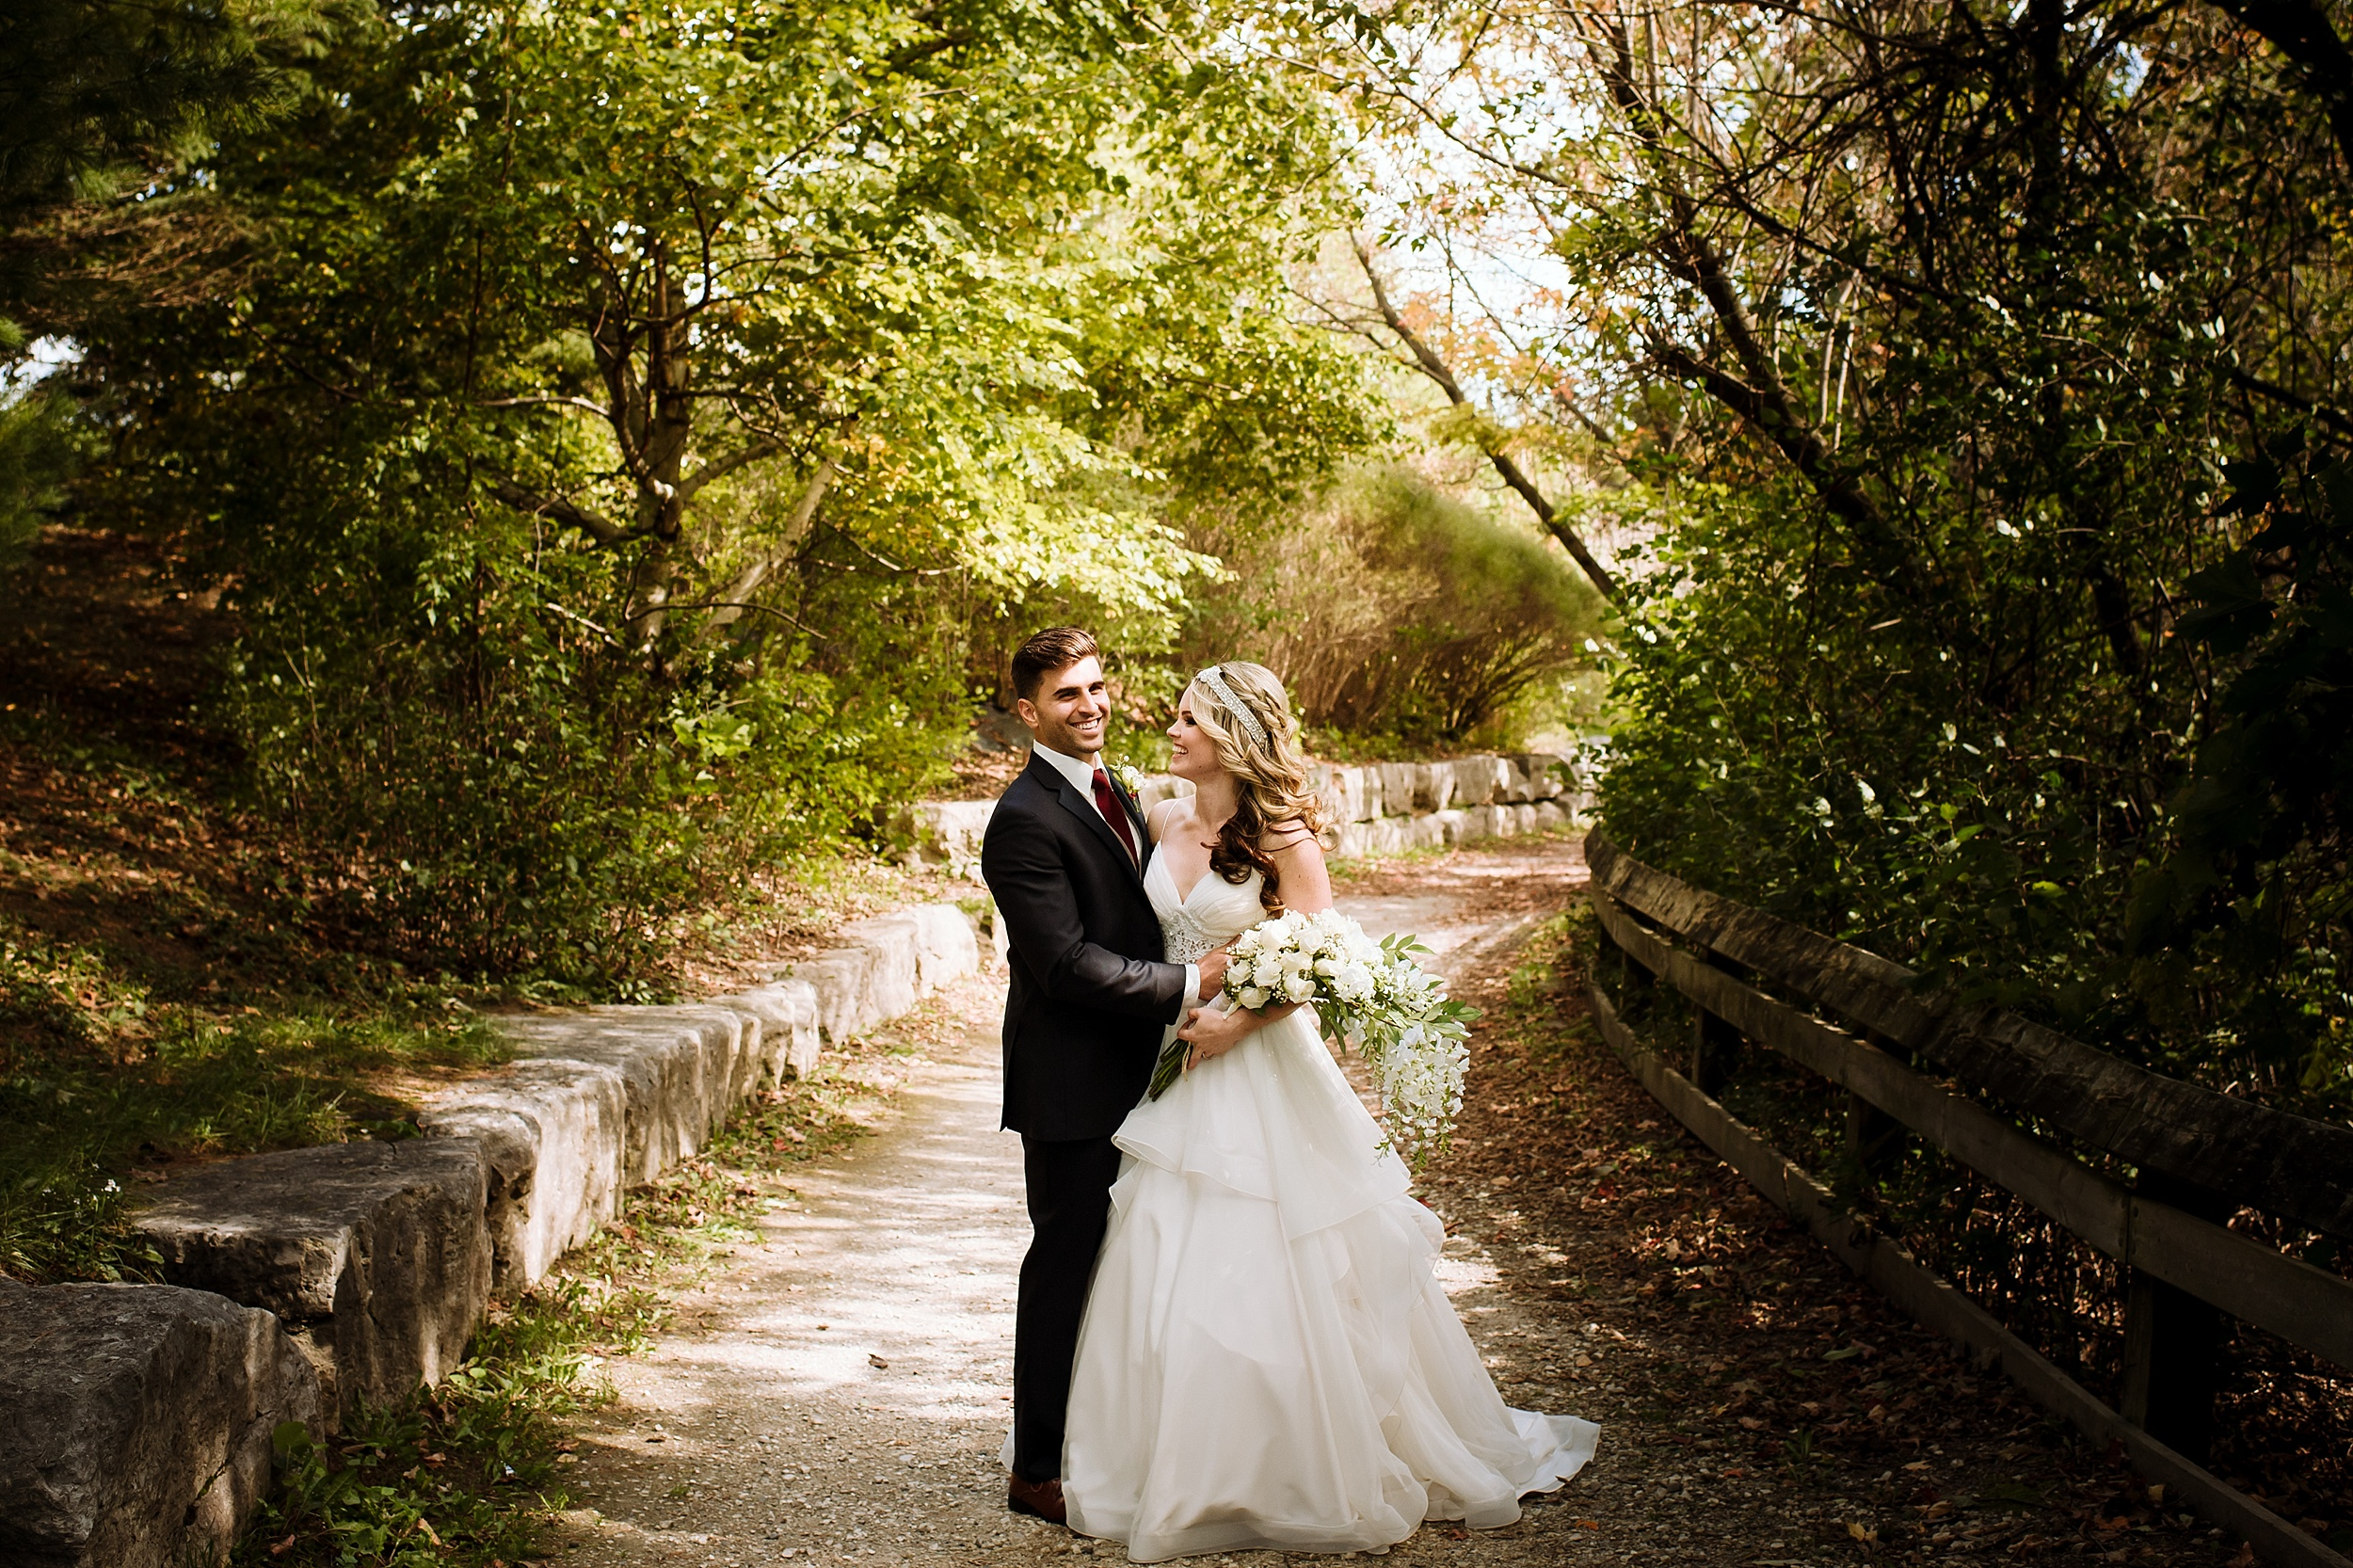 McMichael_Art_Collection_Wedding_chateau_le_jardin_Justine_Munro_Toronto_Photographer013.jpg